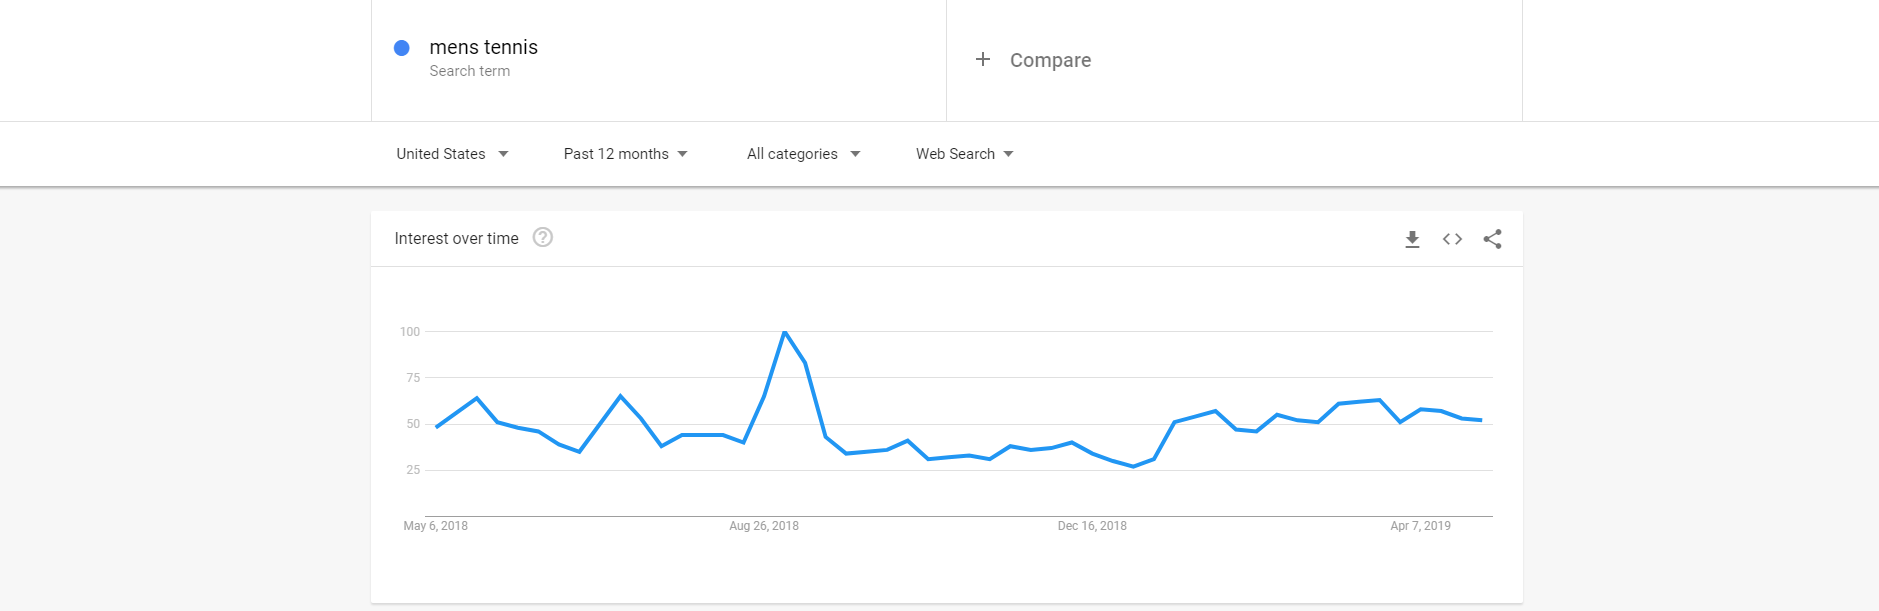 Google Trends interest